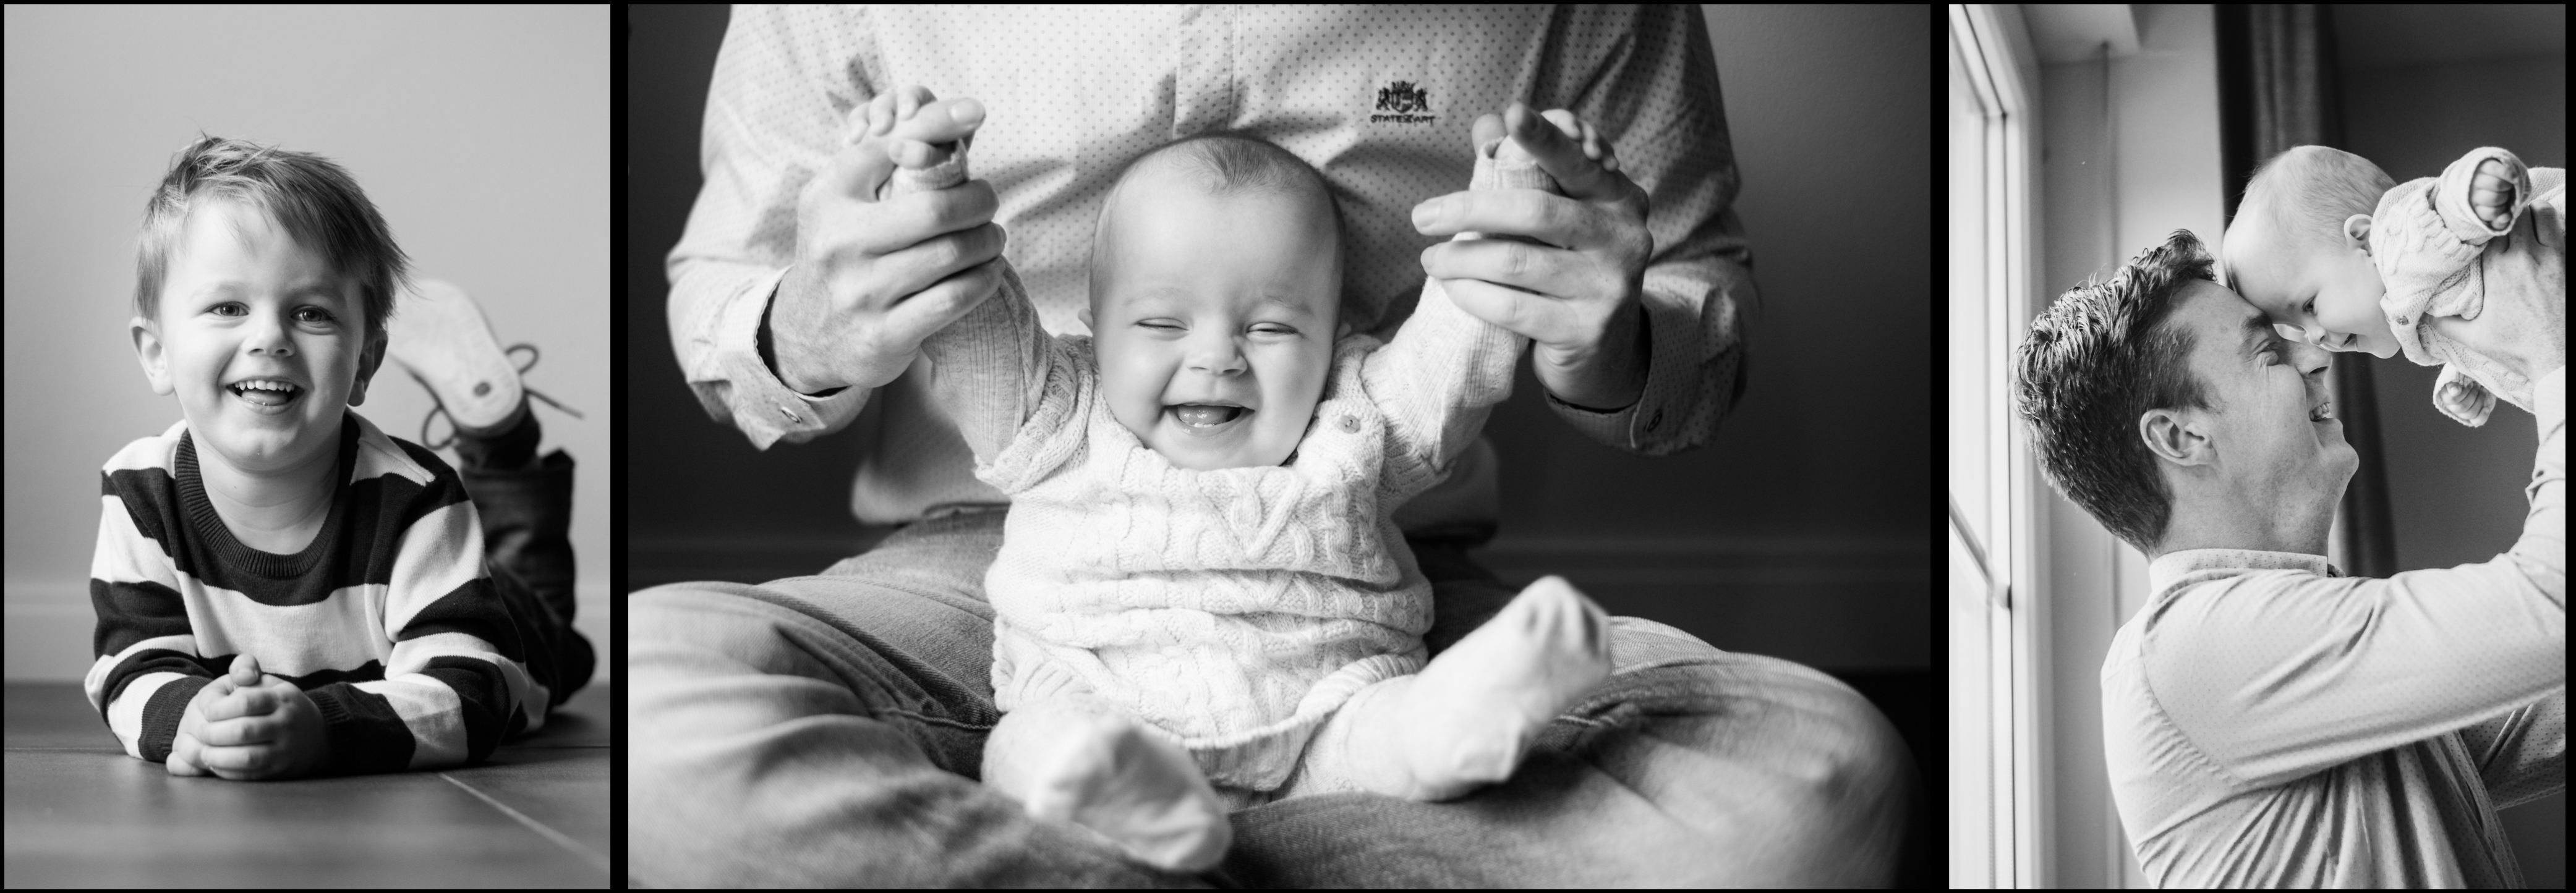 gezinsfotografie Assen